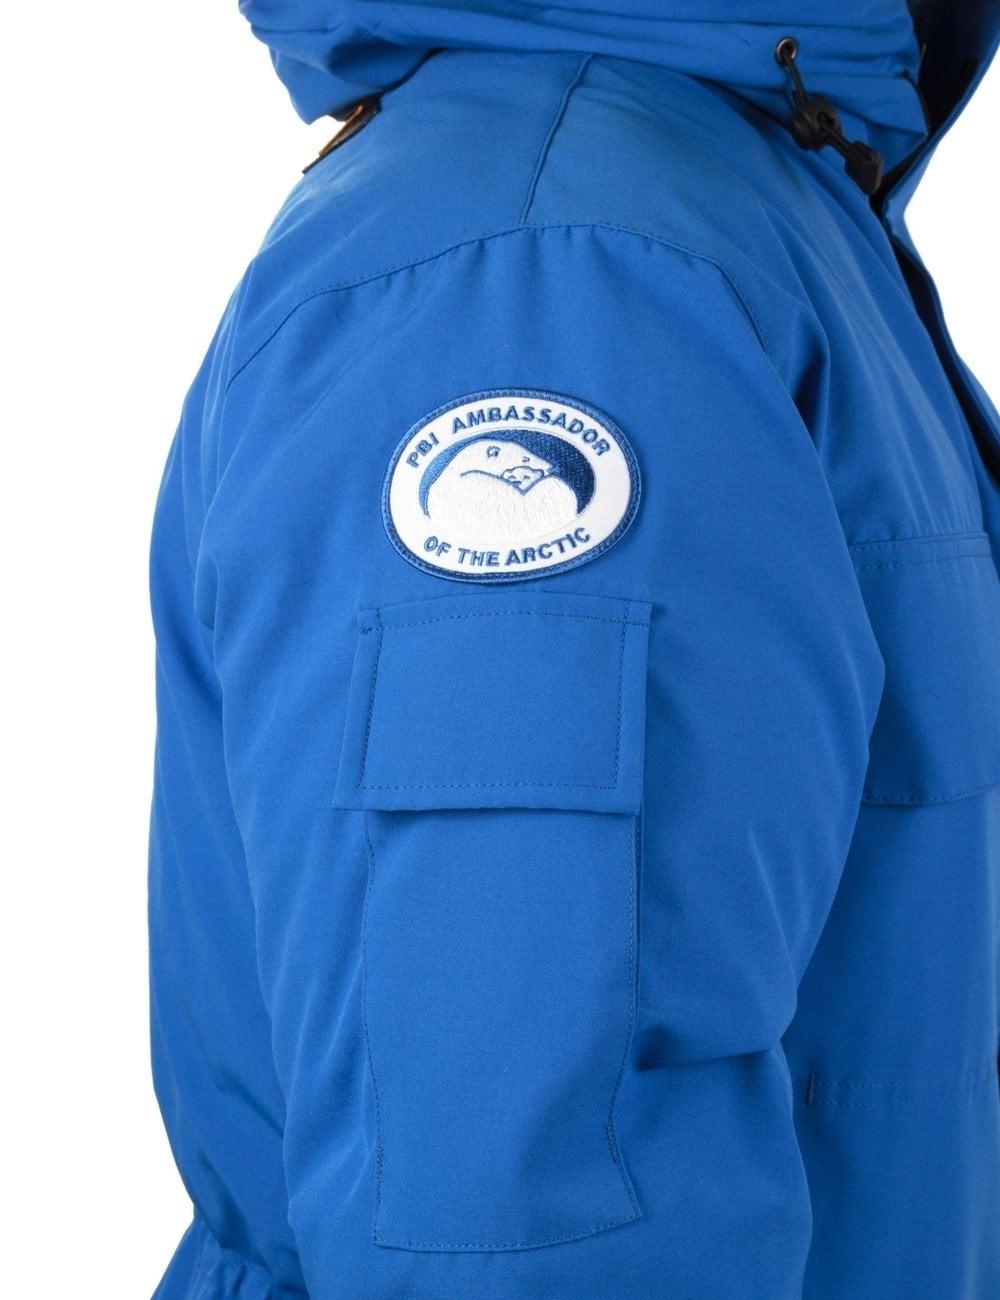 Expedition Parka Polar Bear International - Royal Blue